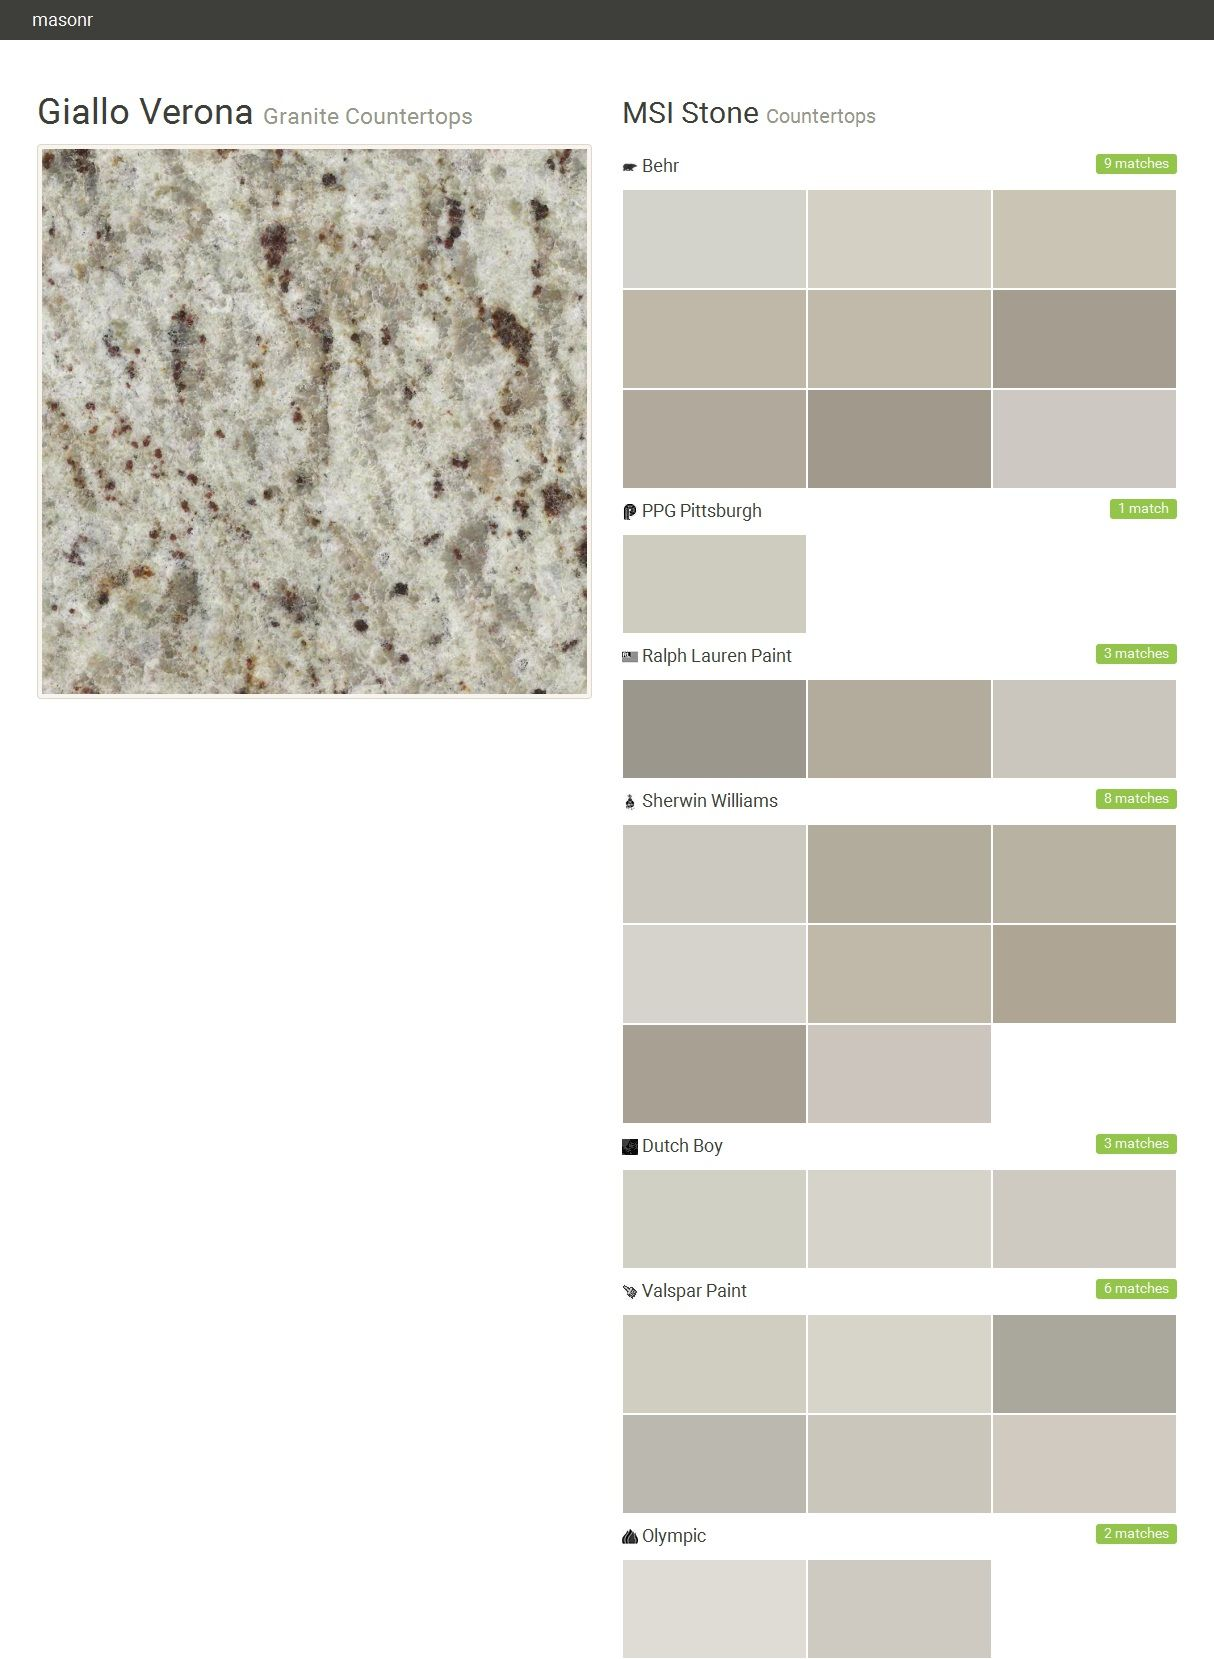 Msi stone kitchen visualizer wow blog for Valspar paint visualizer